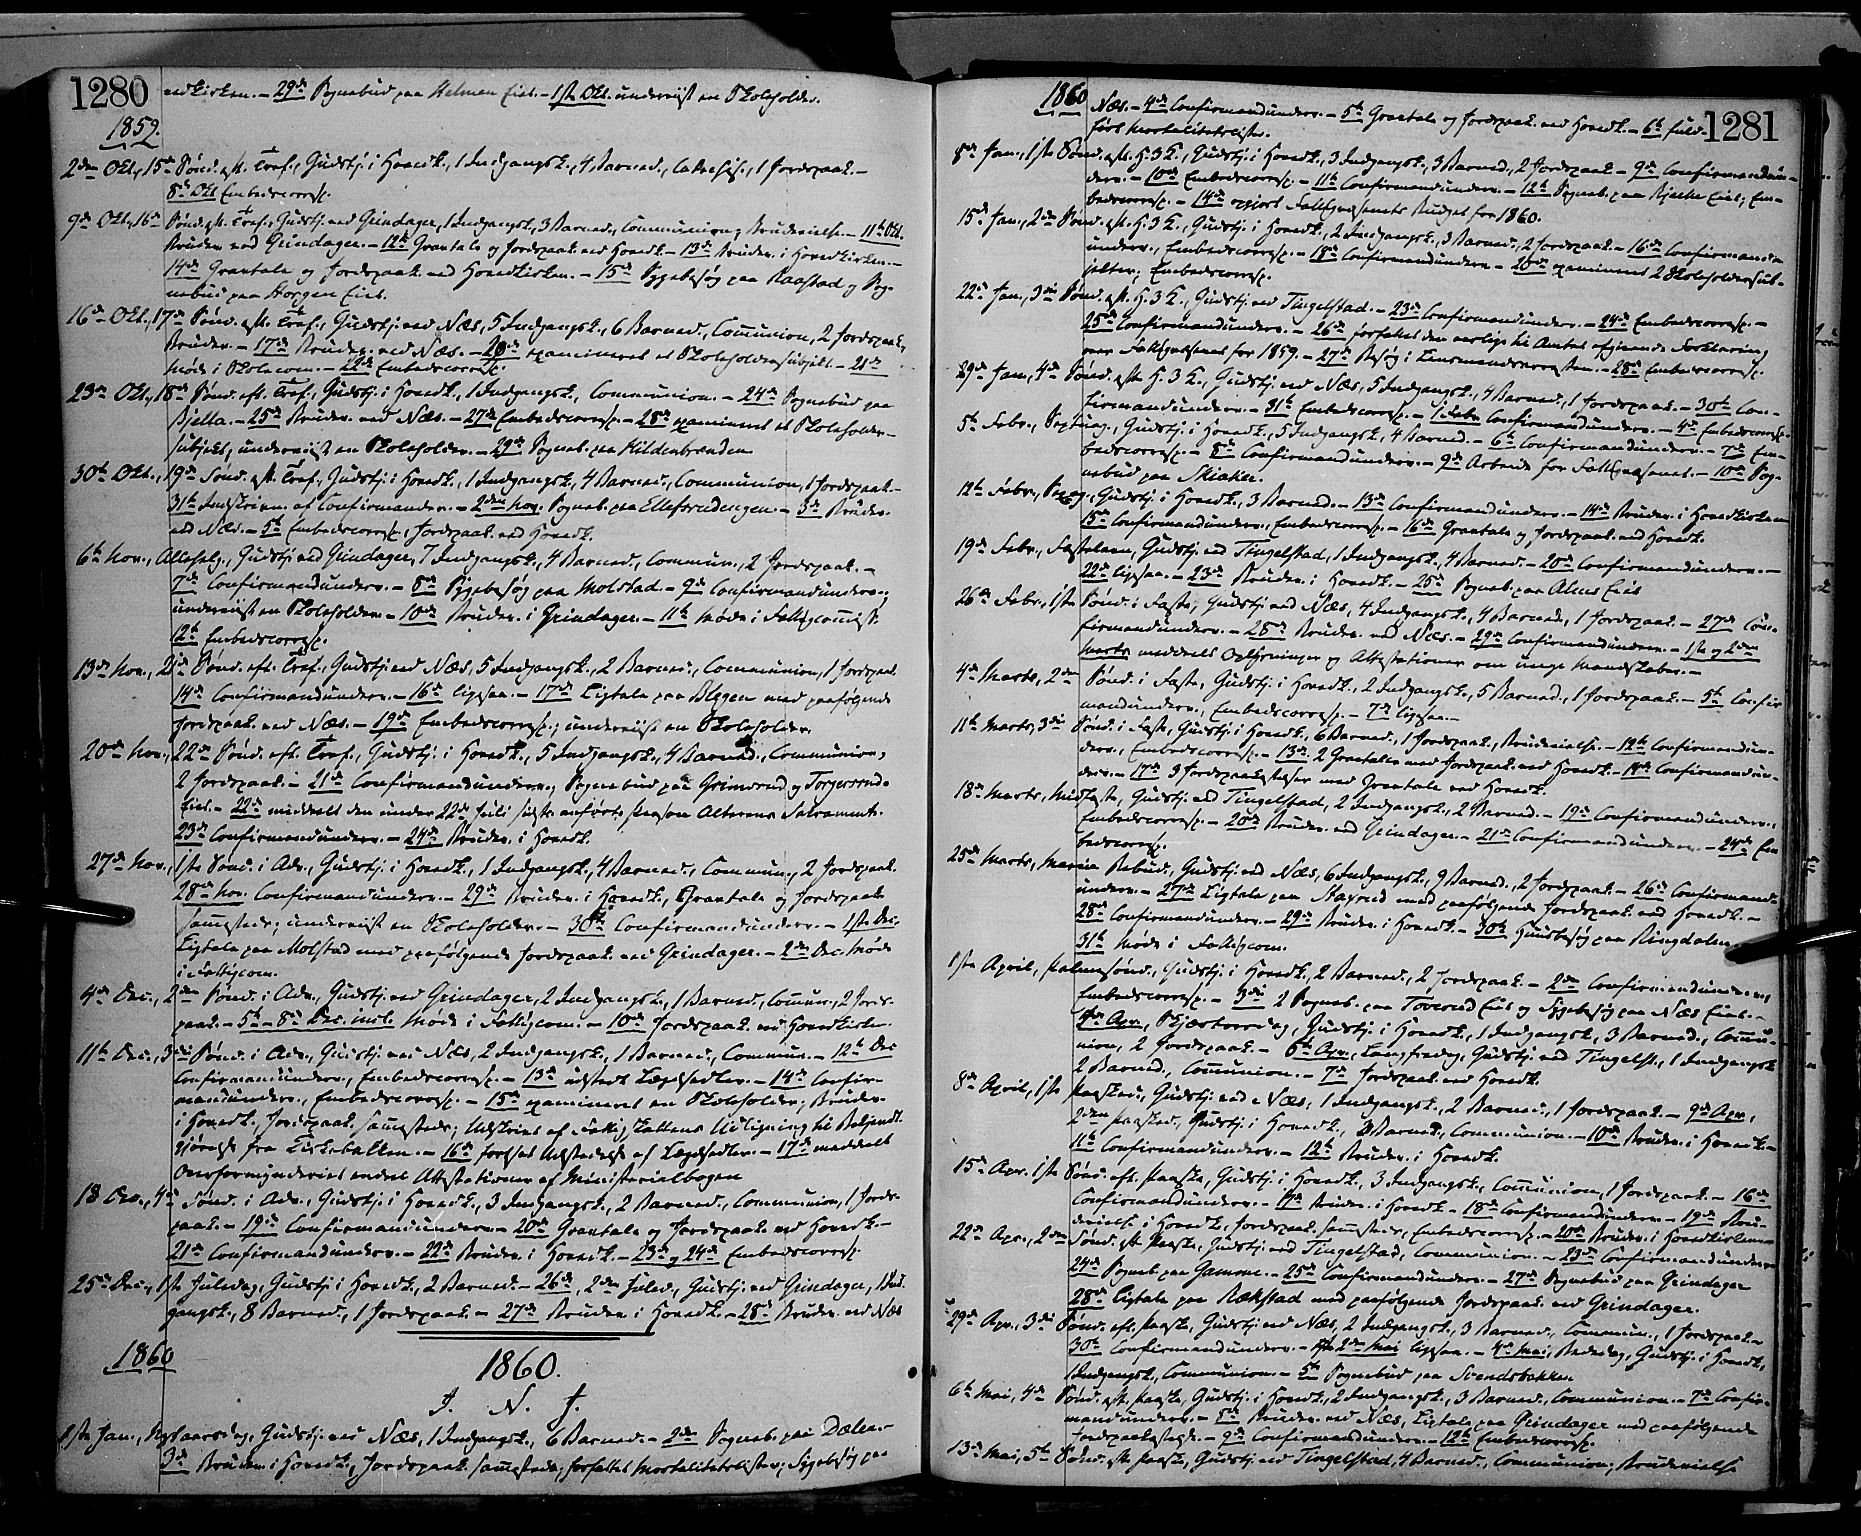 SAH, Gran prestekontor, Ministerialbok nr. 12, 1856-1874, s. 1280-1281